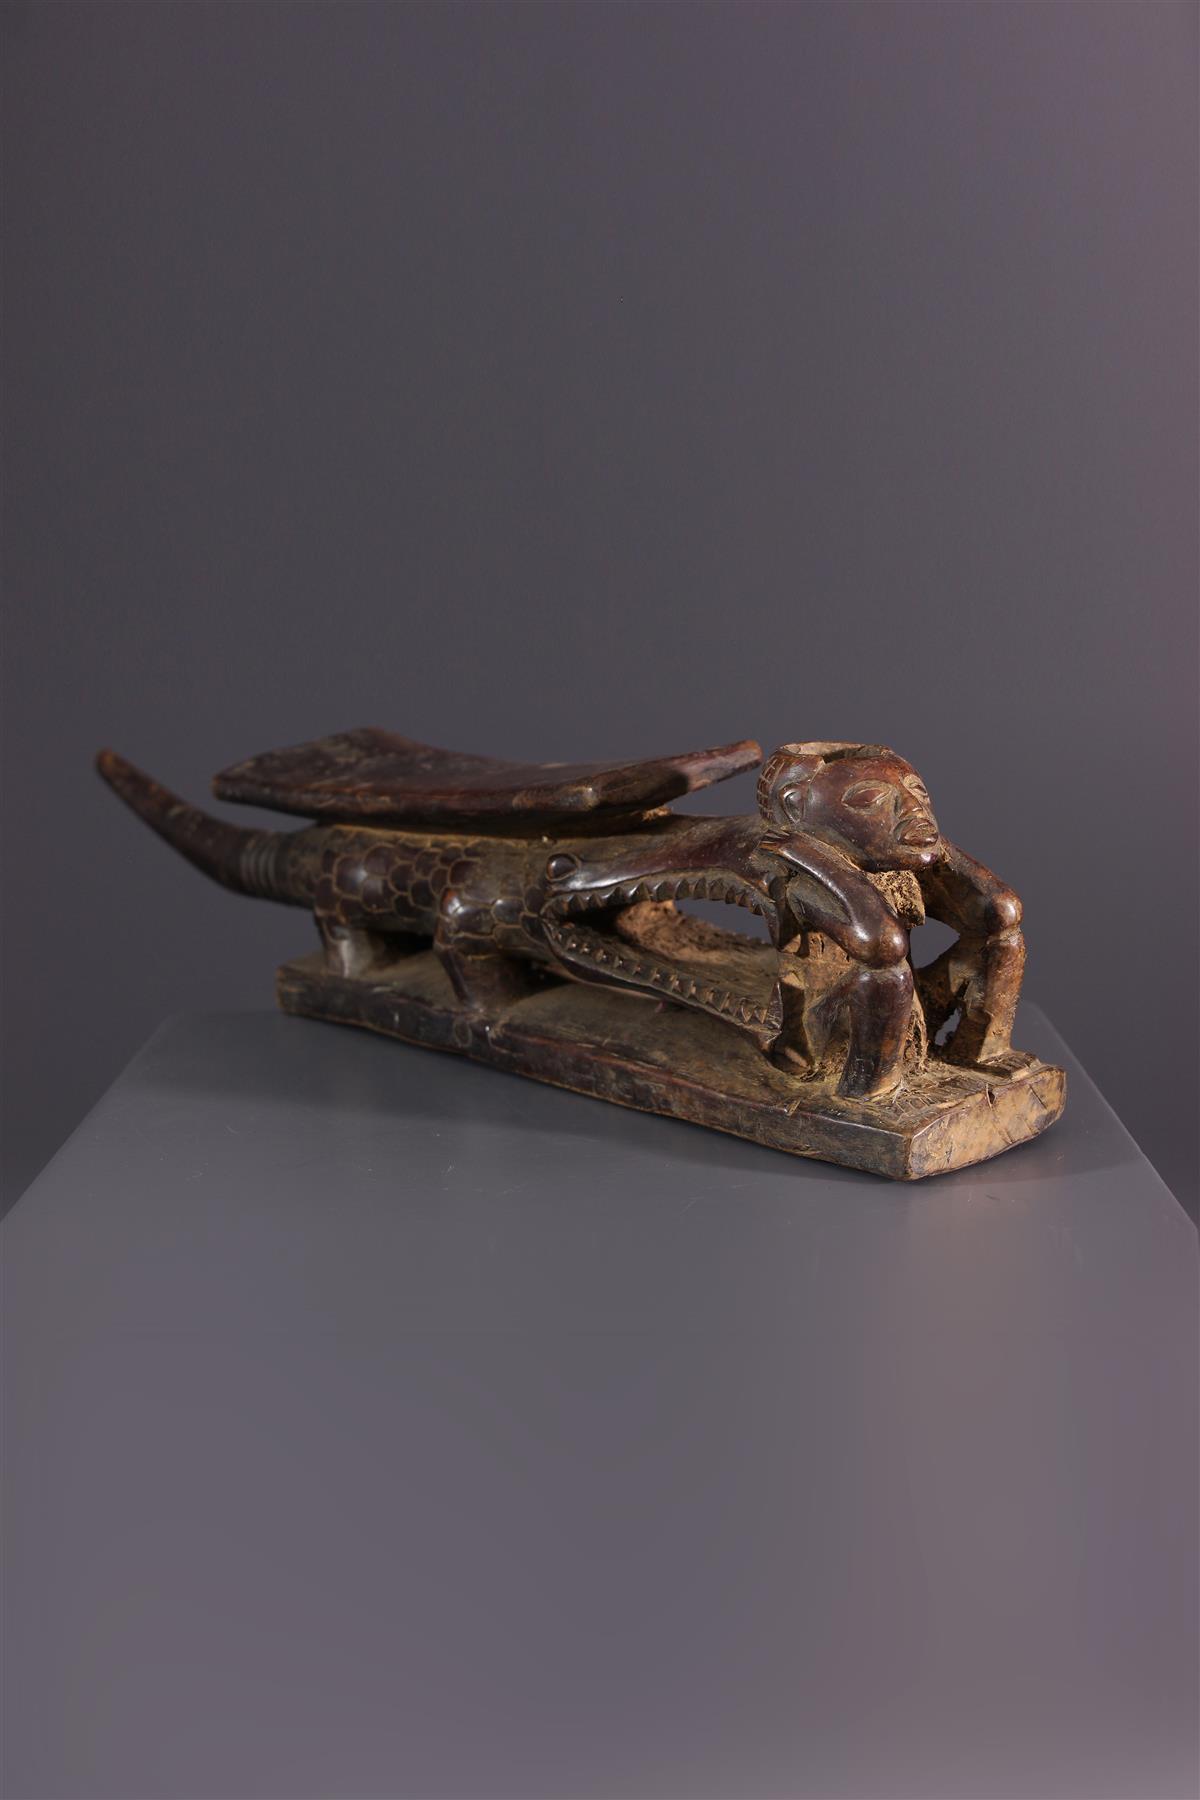 Tabwa pijp - Afrikaanse kunst